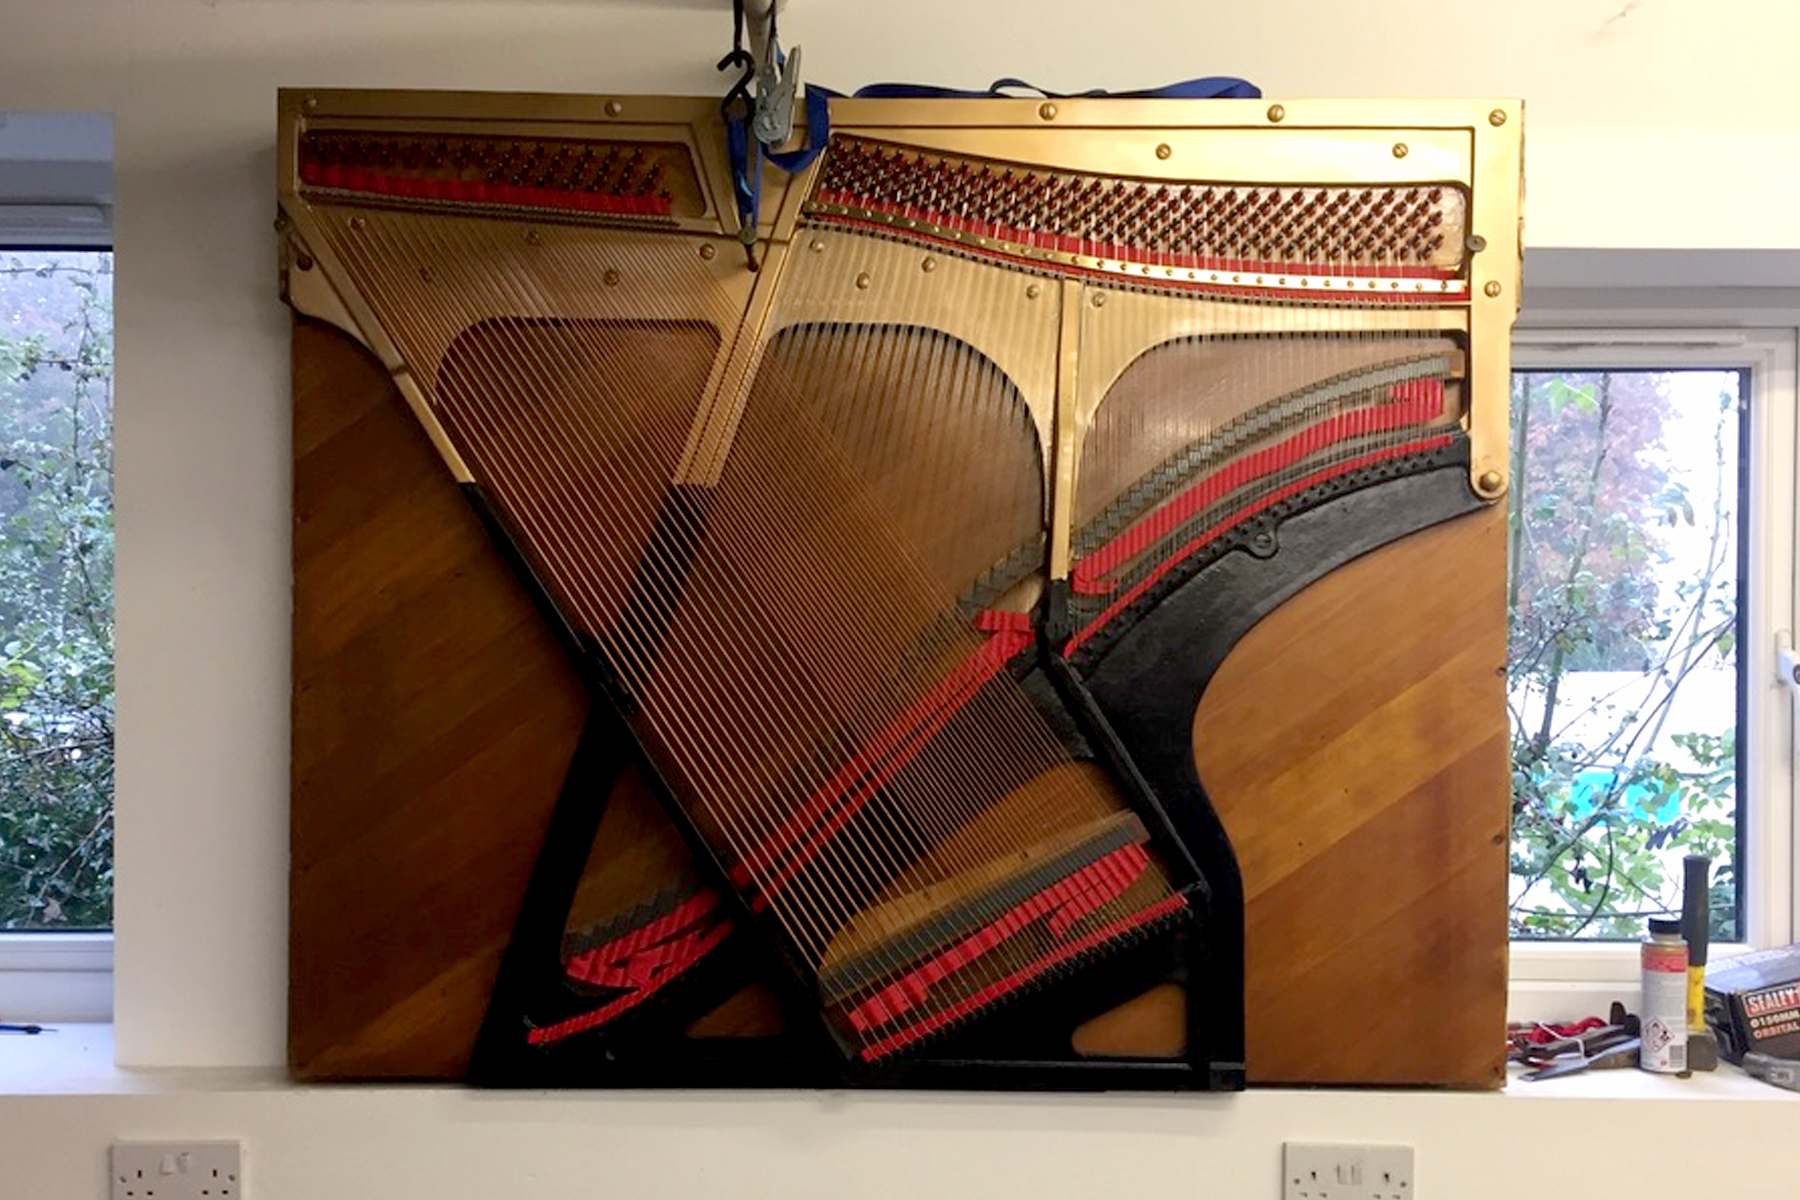 Hanging piano artwork